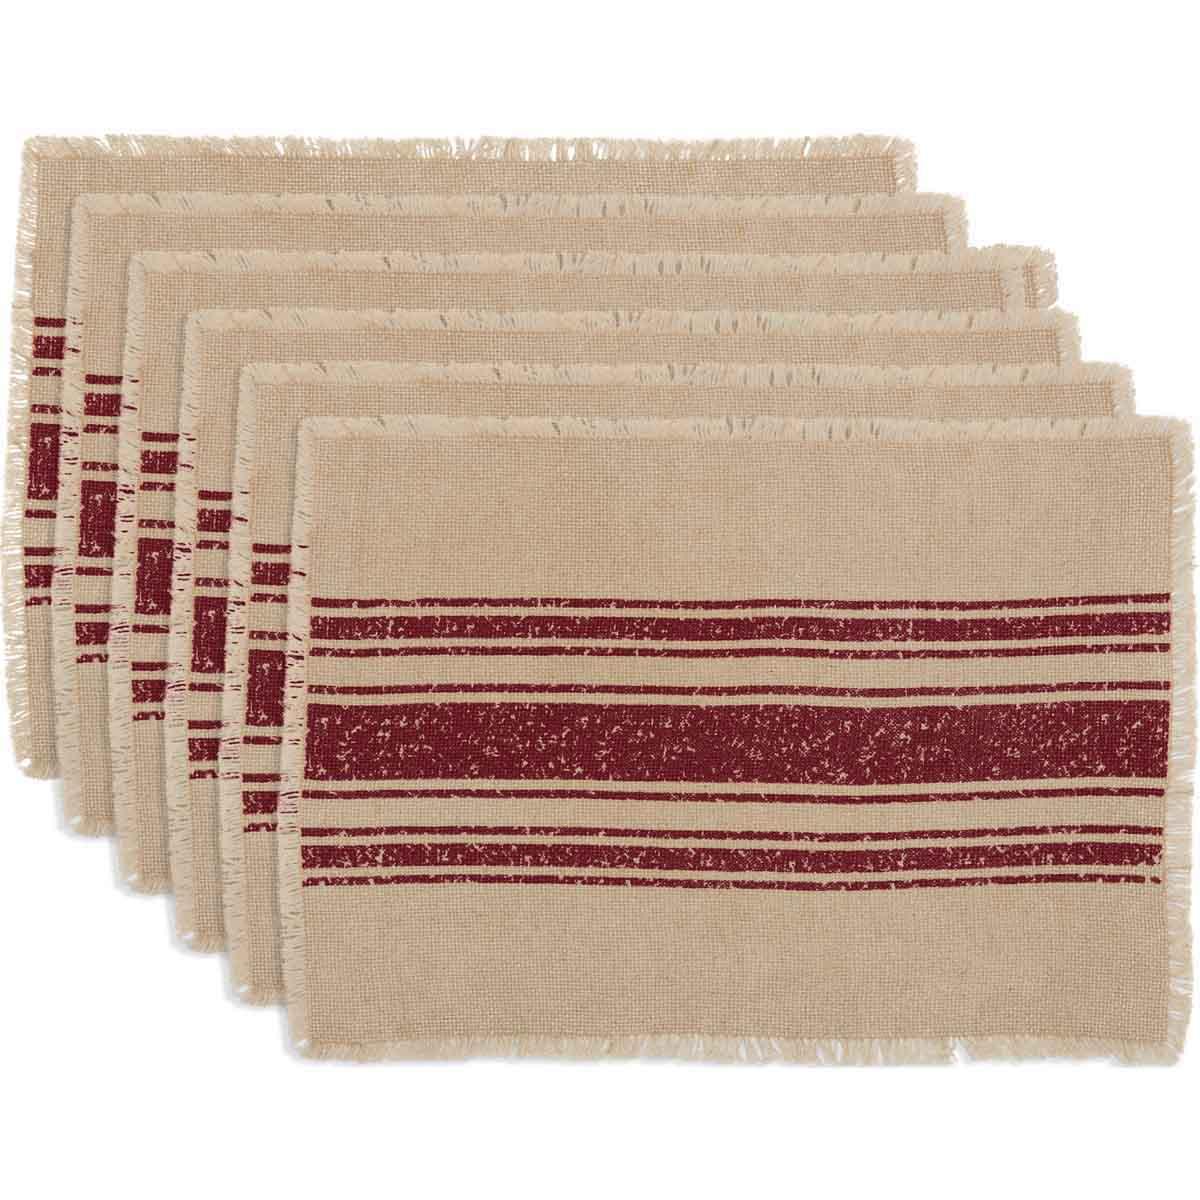 Vintage Burlap Stripe Red Placemat Set of 6 12x18